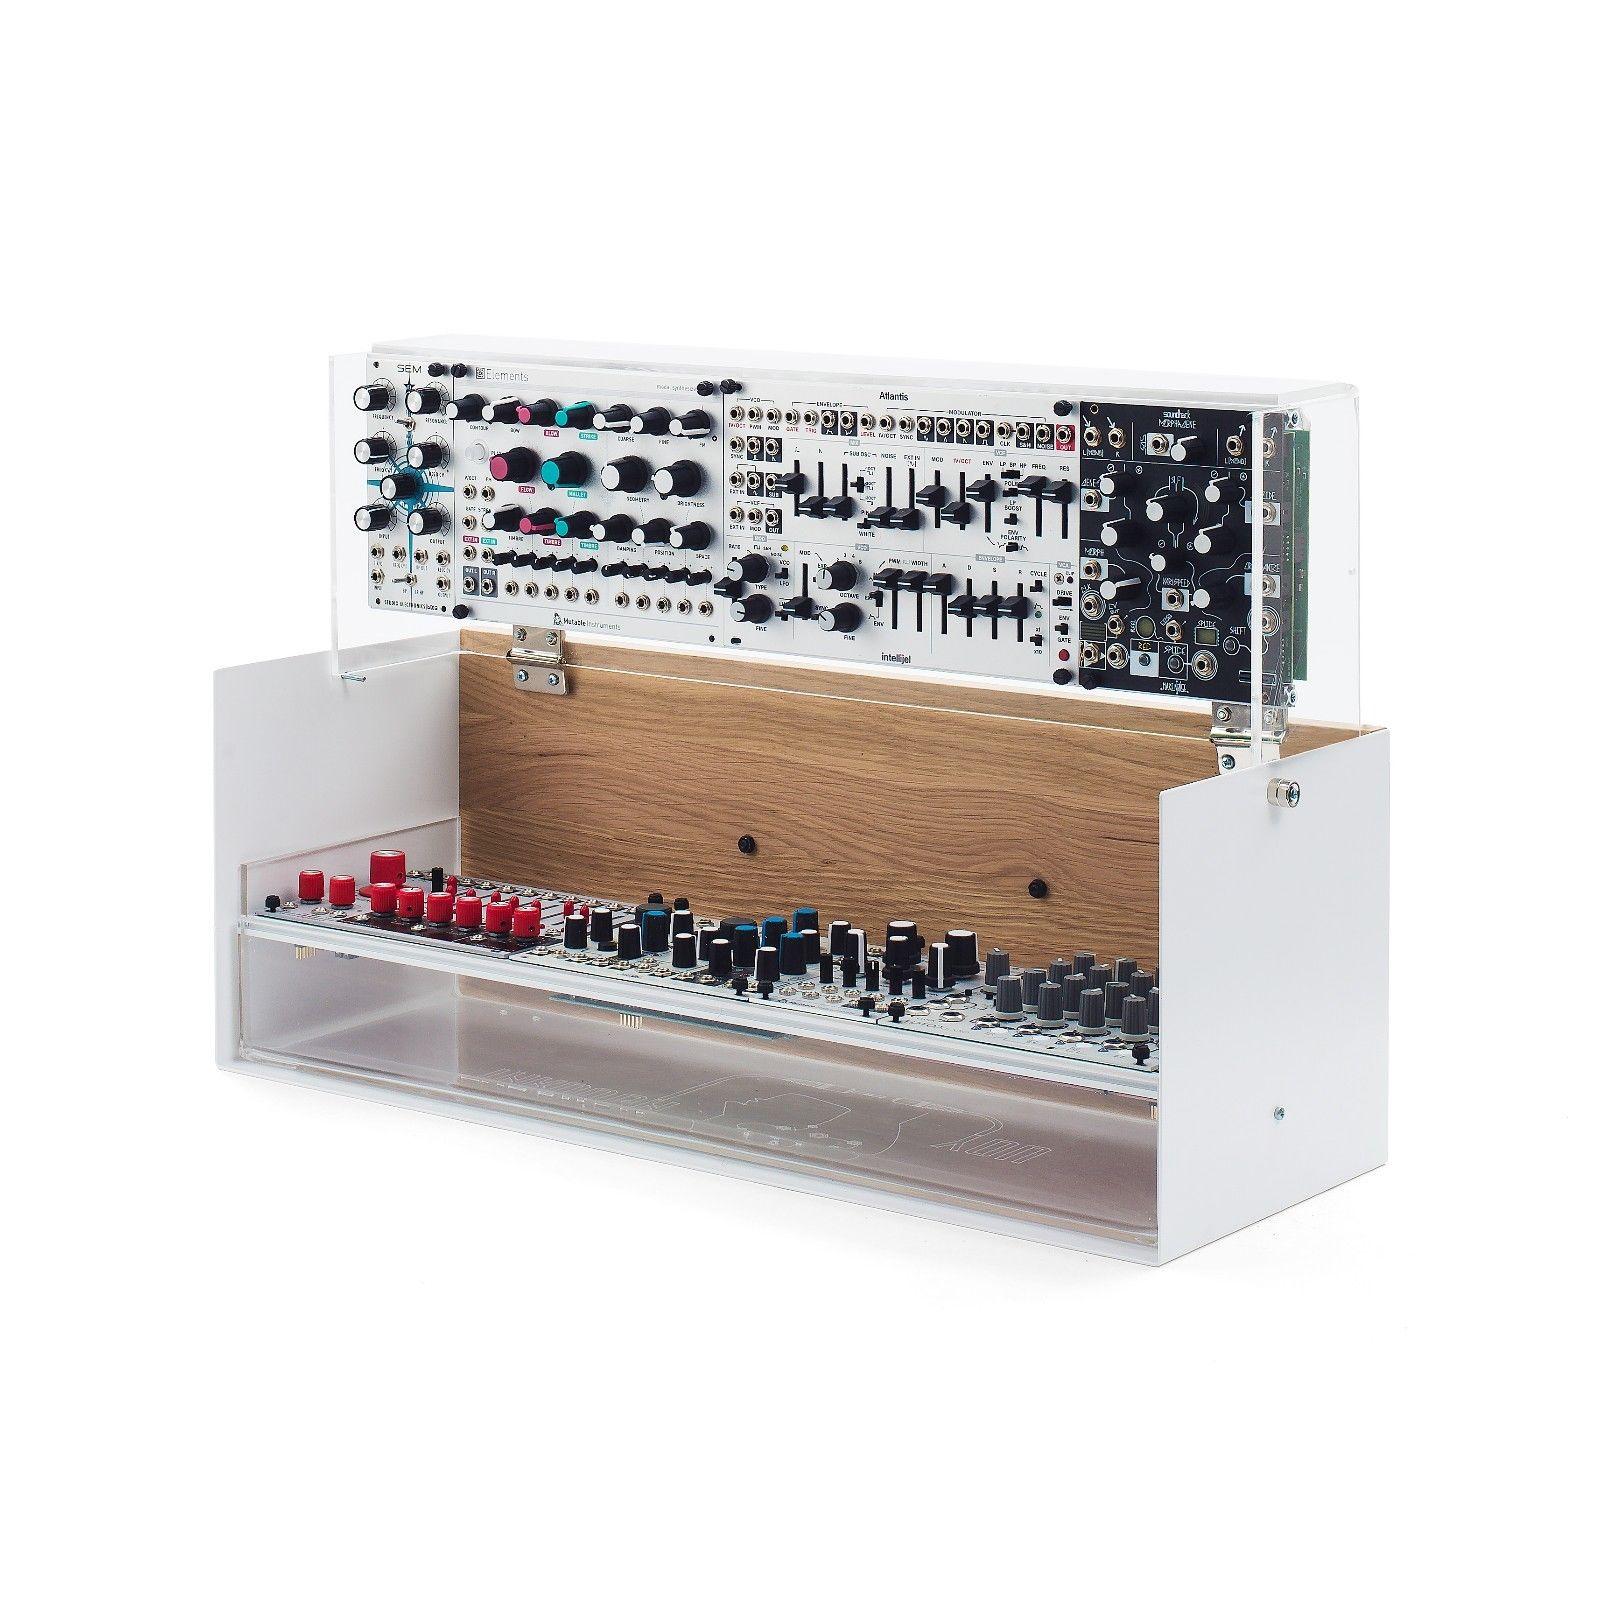 matrixsynth unique hinged eurorack robocase 6u 104hp modular synthesizer rack case. Black Bedroom Furniture Sets. Home Design Ideas